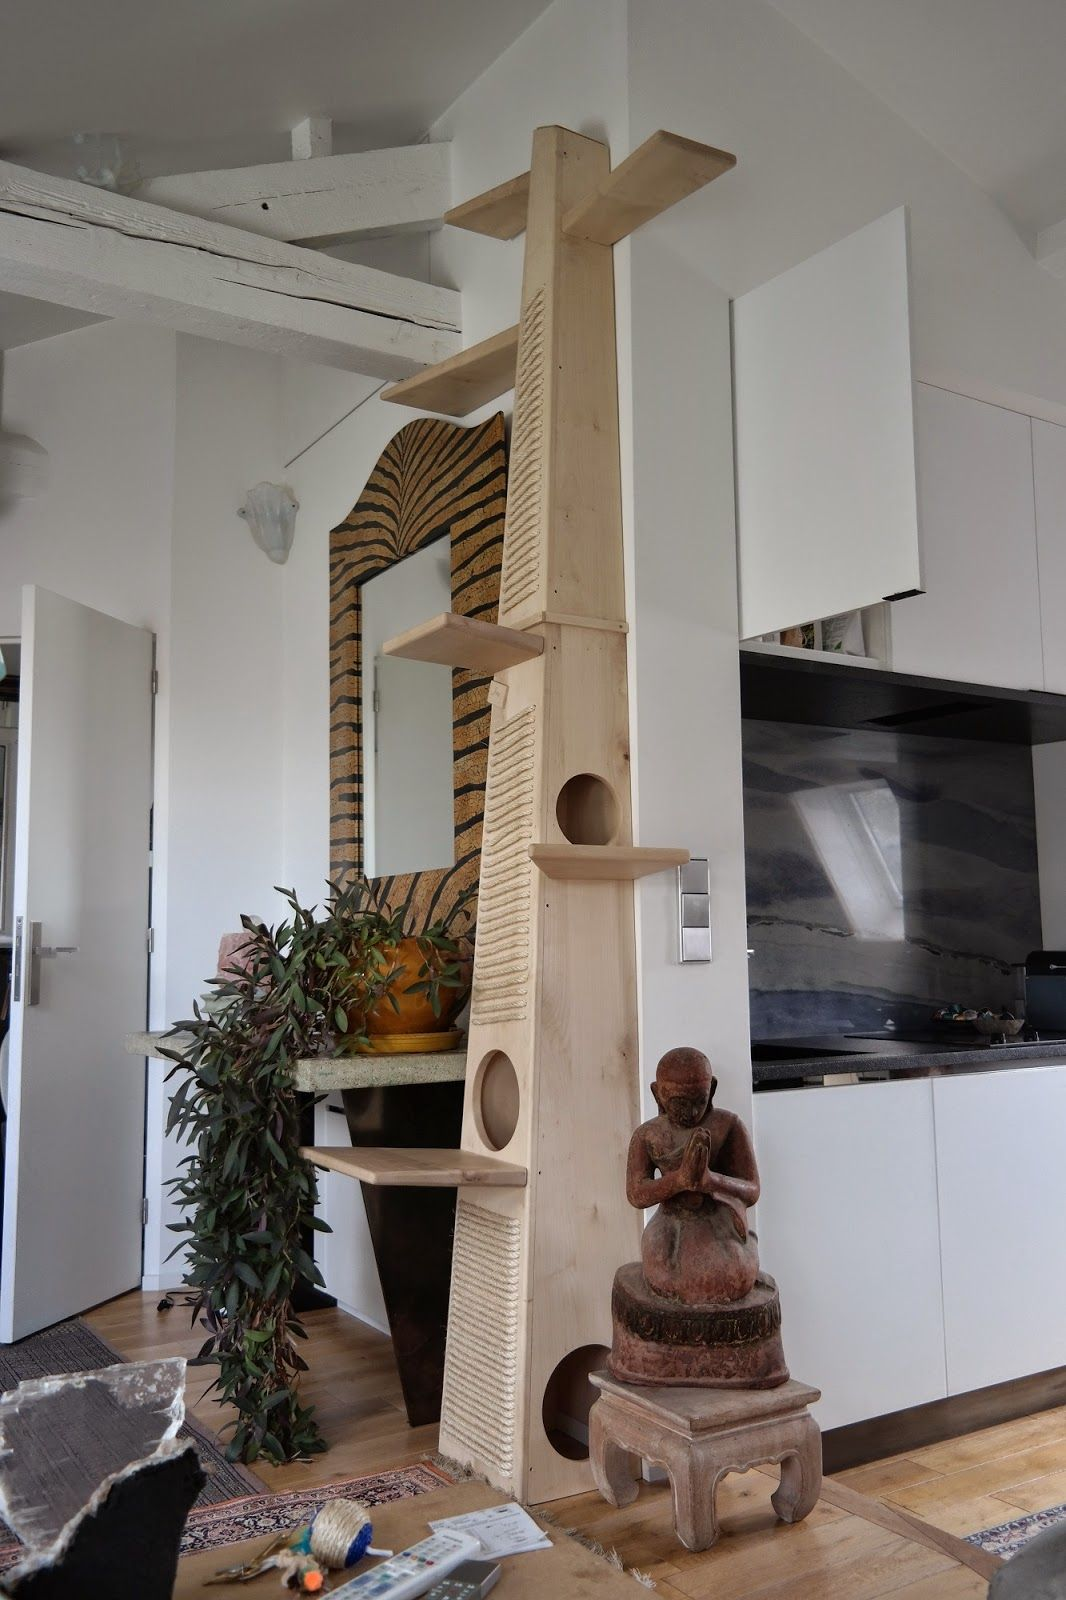 labo voluptas eb nisterie arbre chat sur mesure chien. Black Bedroom Furniture Sets. Home Design Ideas